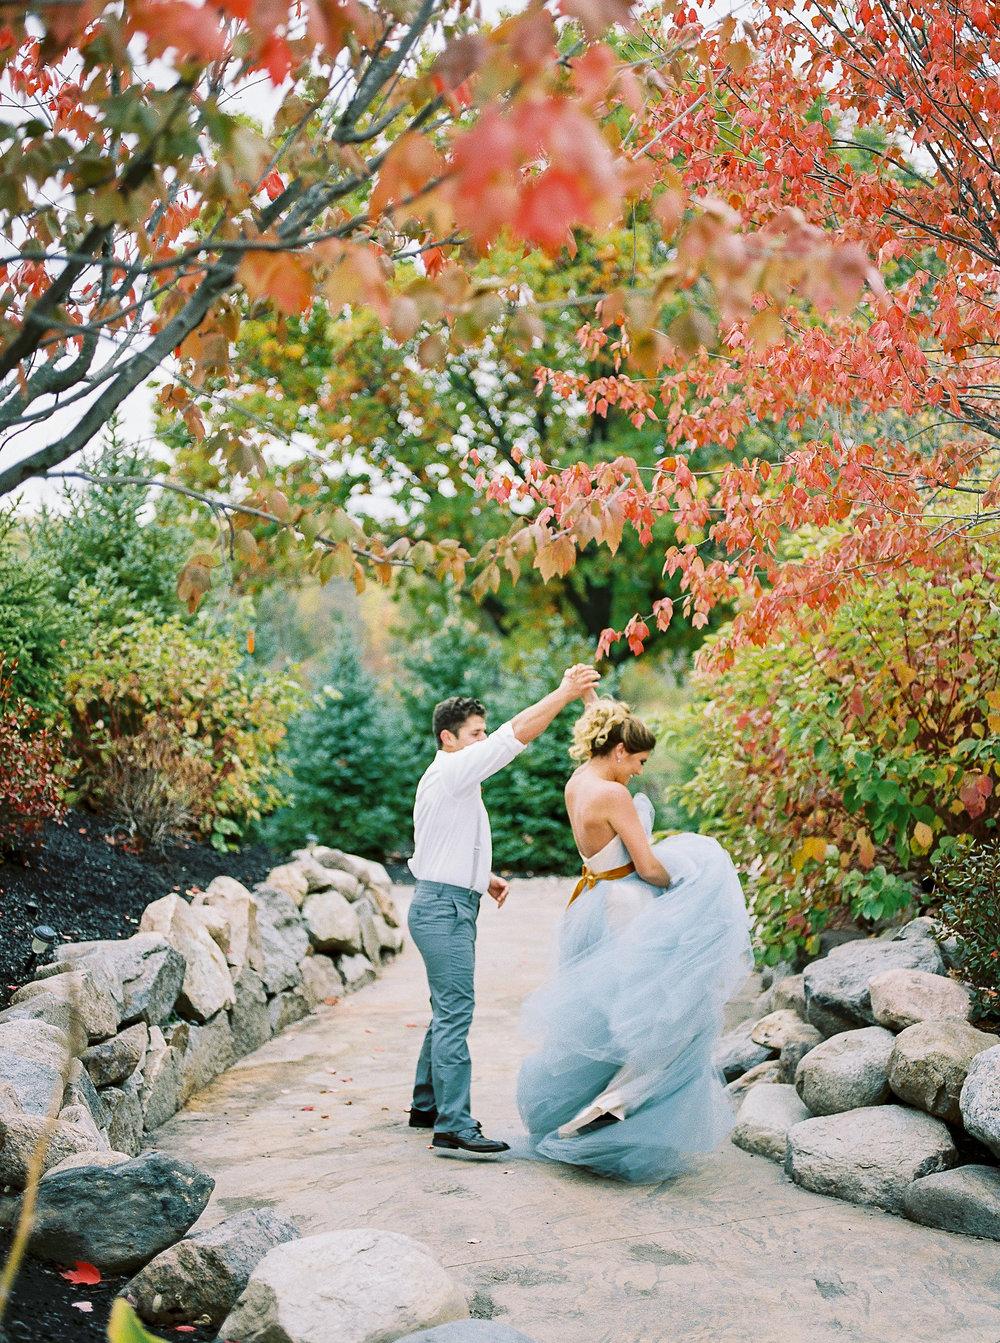 Alexandra-Elise-Photography-Ali-Reed-Film-Wedding-Photographer-Deerfield-Country-Club-068.jpg